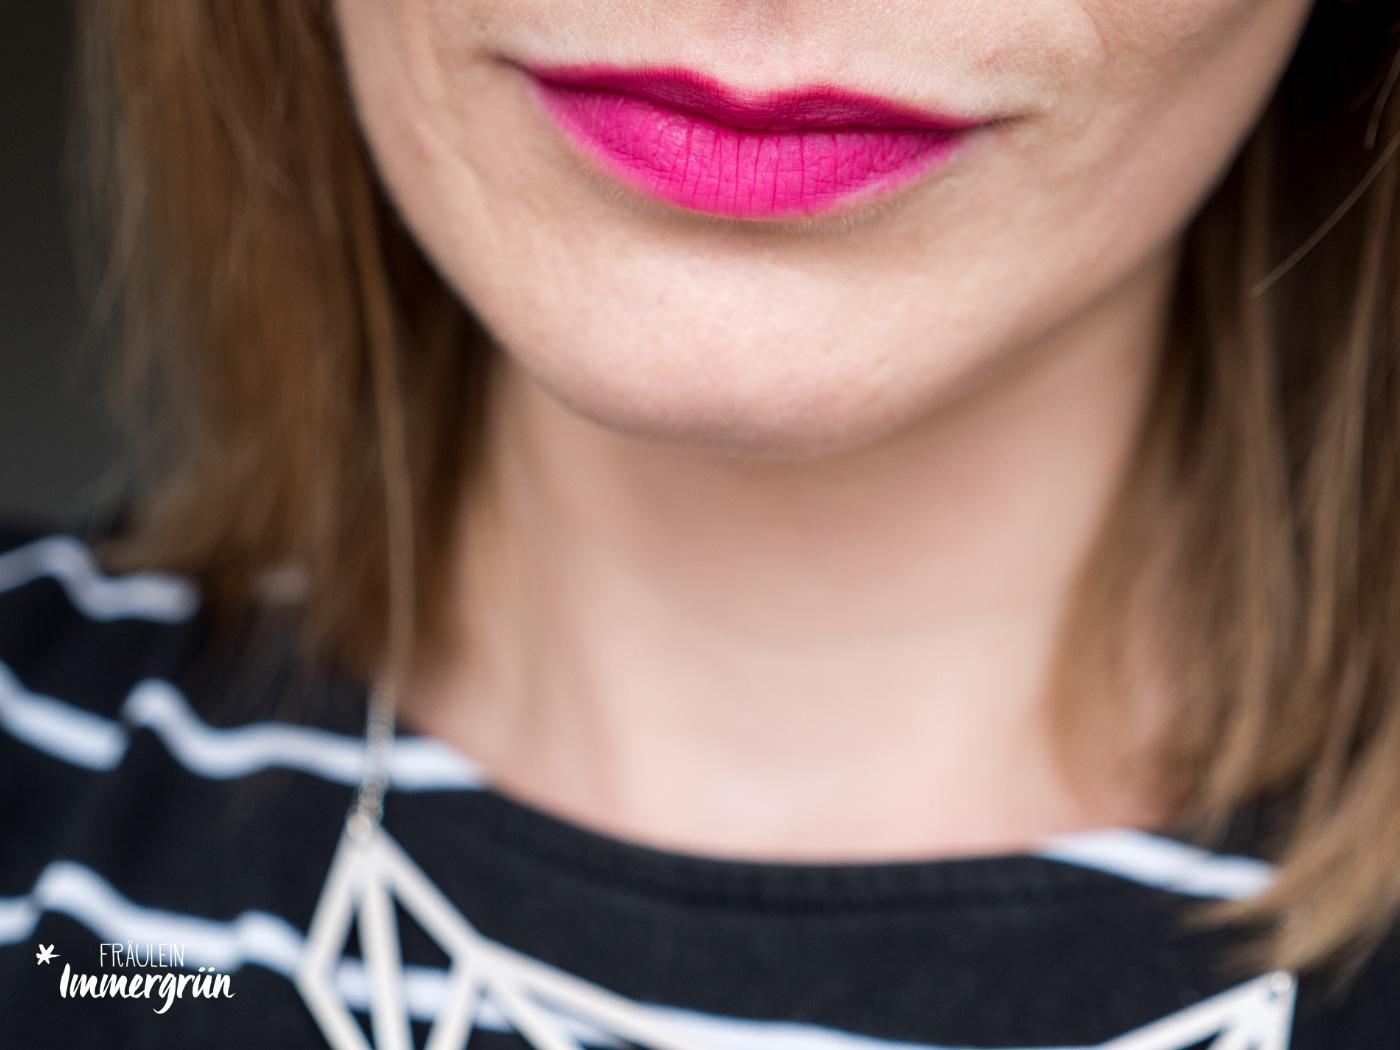 100 Percent Pure natuerlicher Lippenstift: Tragefoto von Cocoa Butter Semi-Matte Lipstick Marrakesh – Stain. Vegane Naturkosmetik.